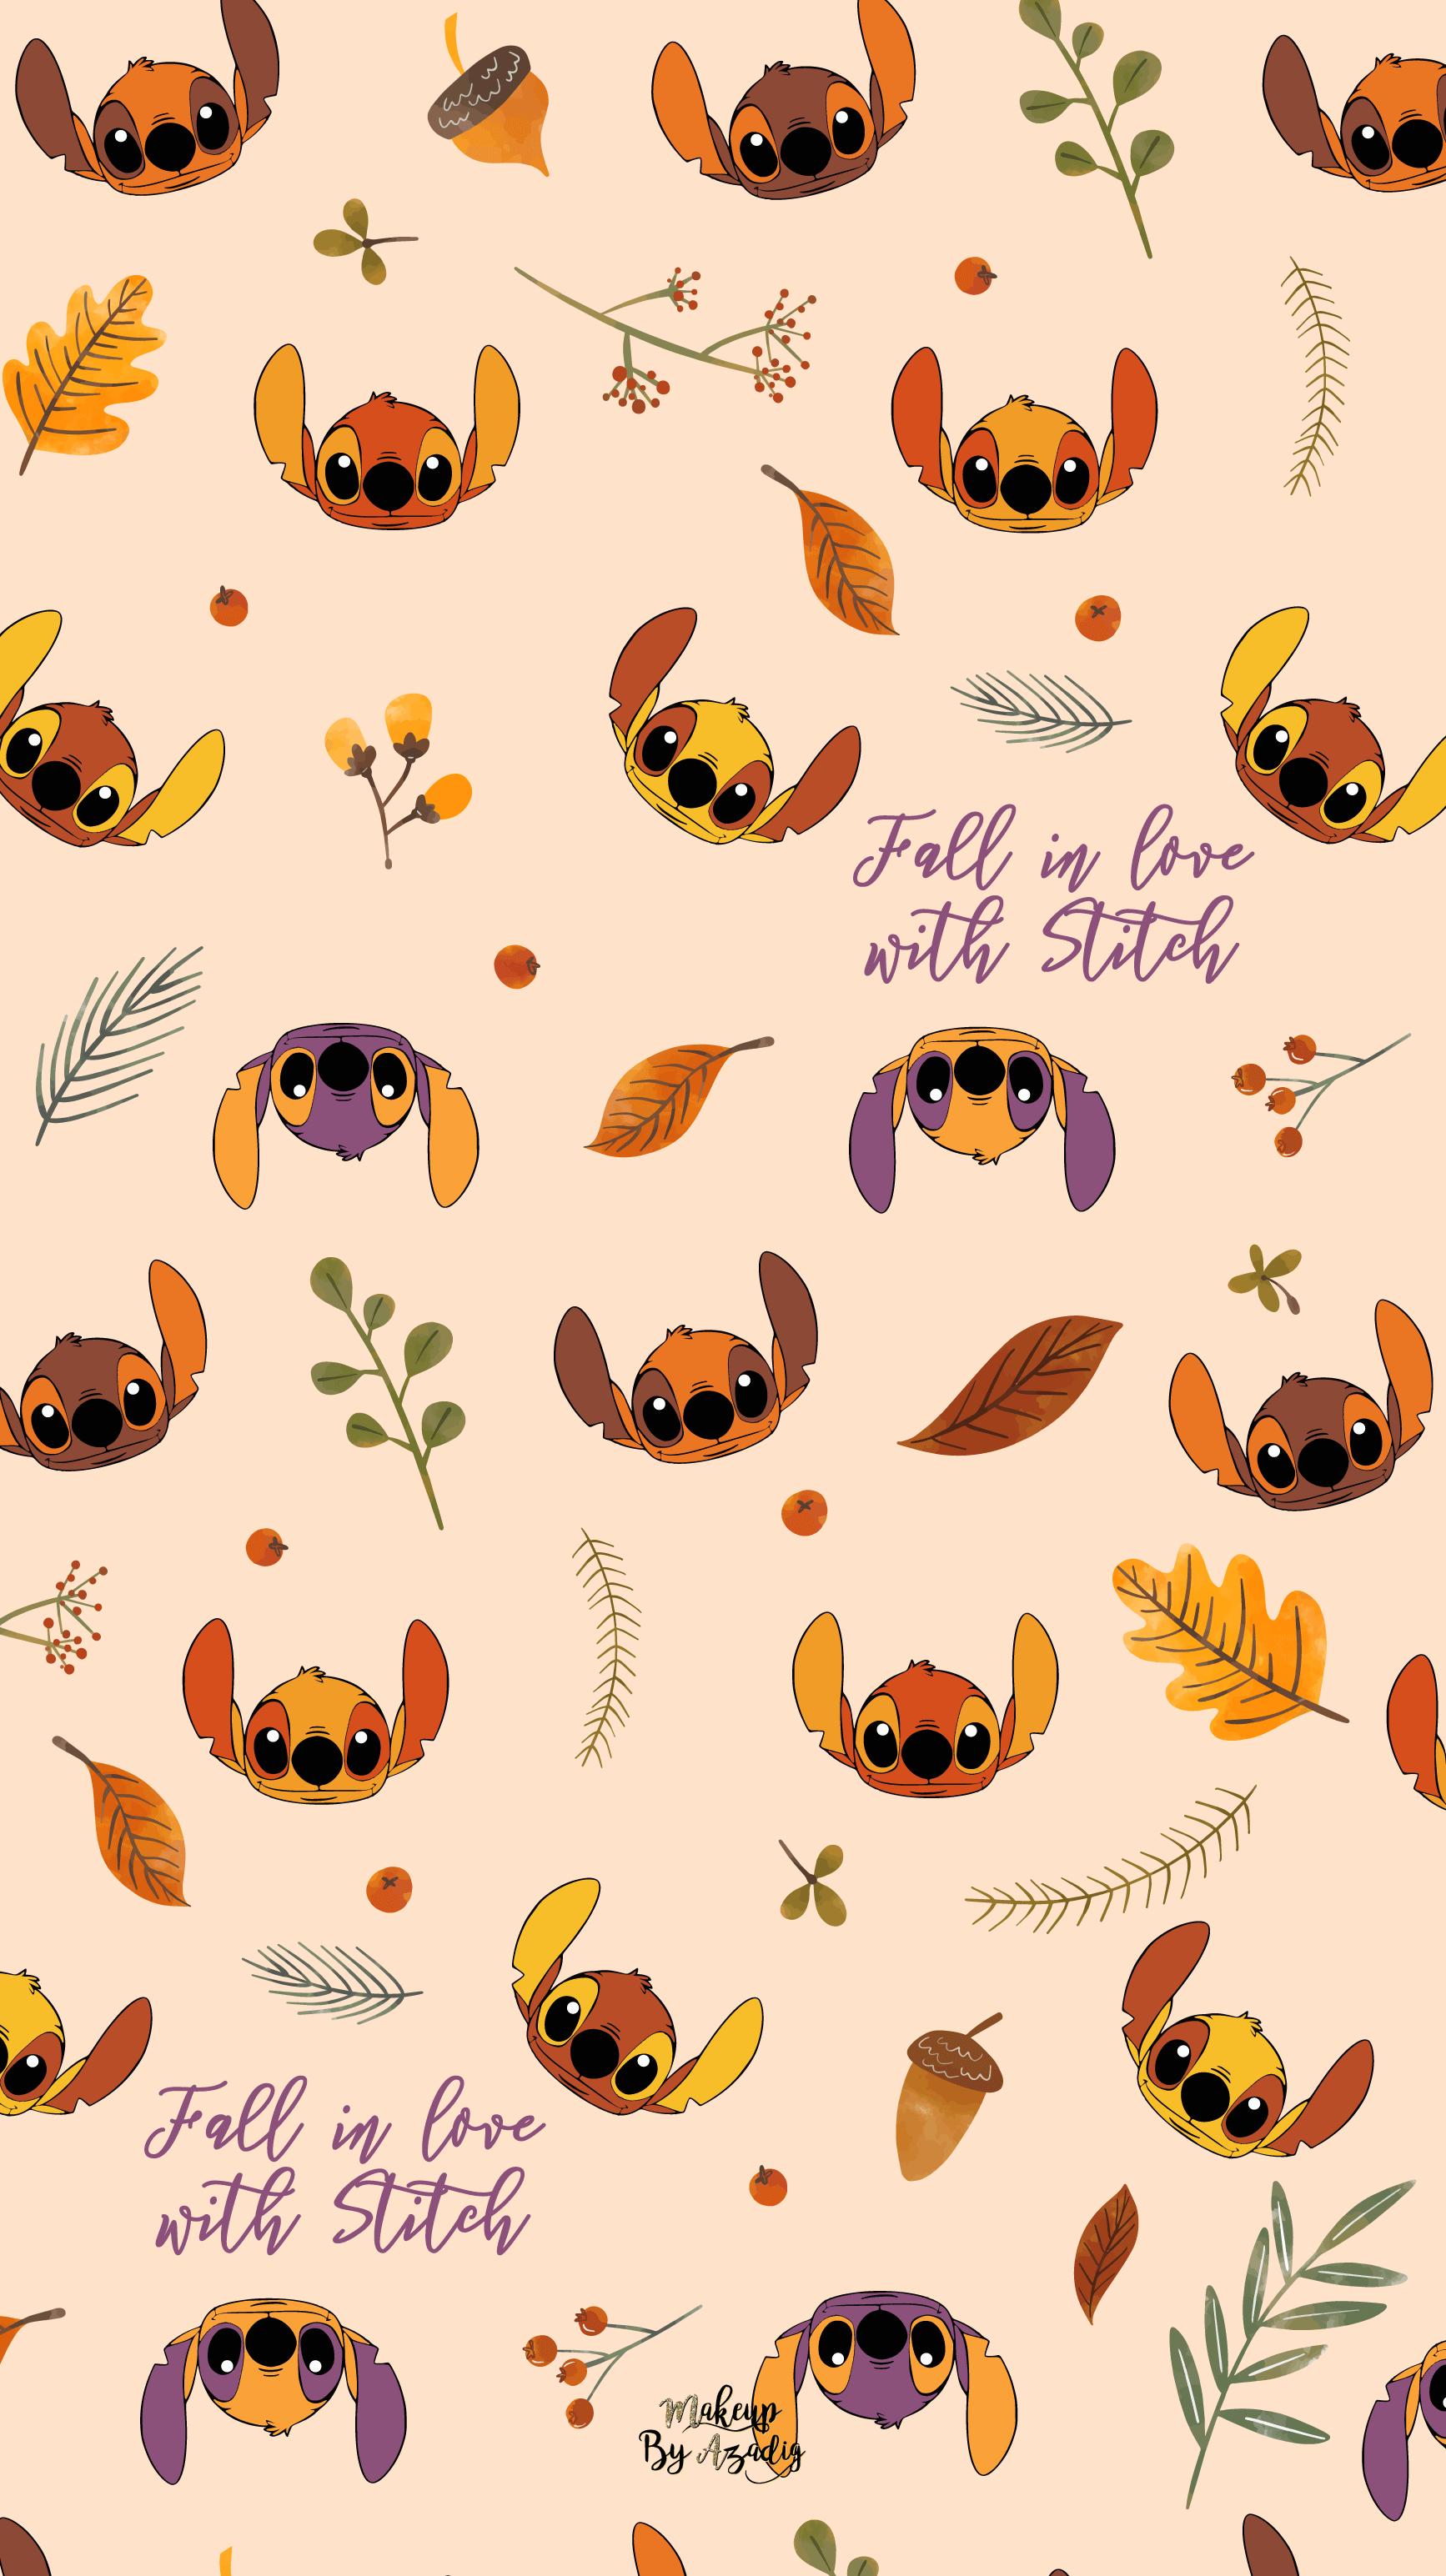 fond-decran-stitch-autumn-automne-fallinlove-disney-samsung-iphone-6-7-8-makeupbyazadig-tendance